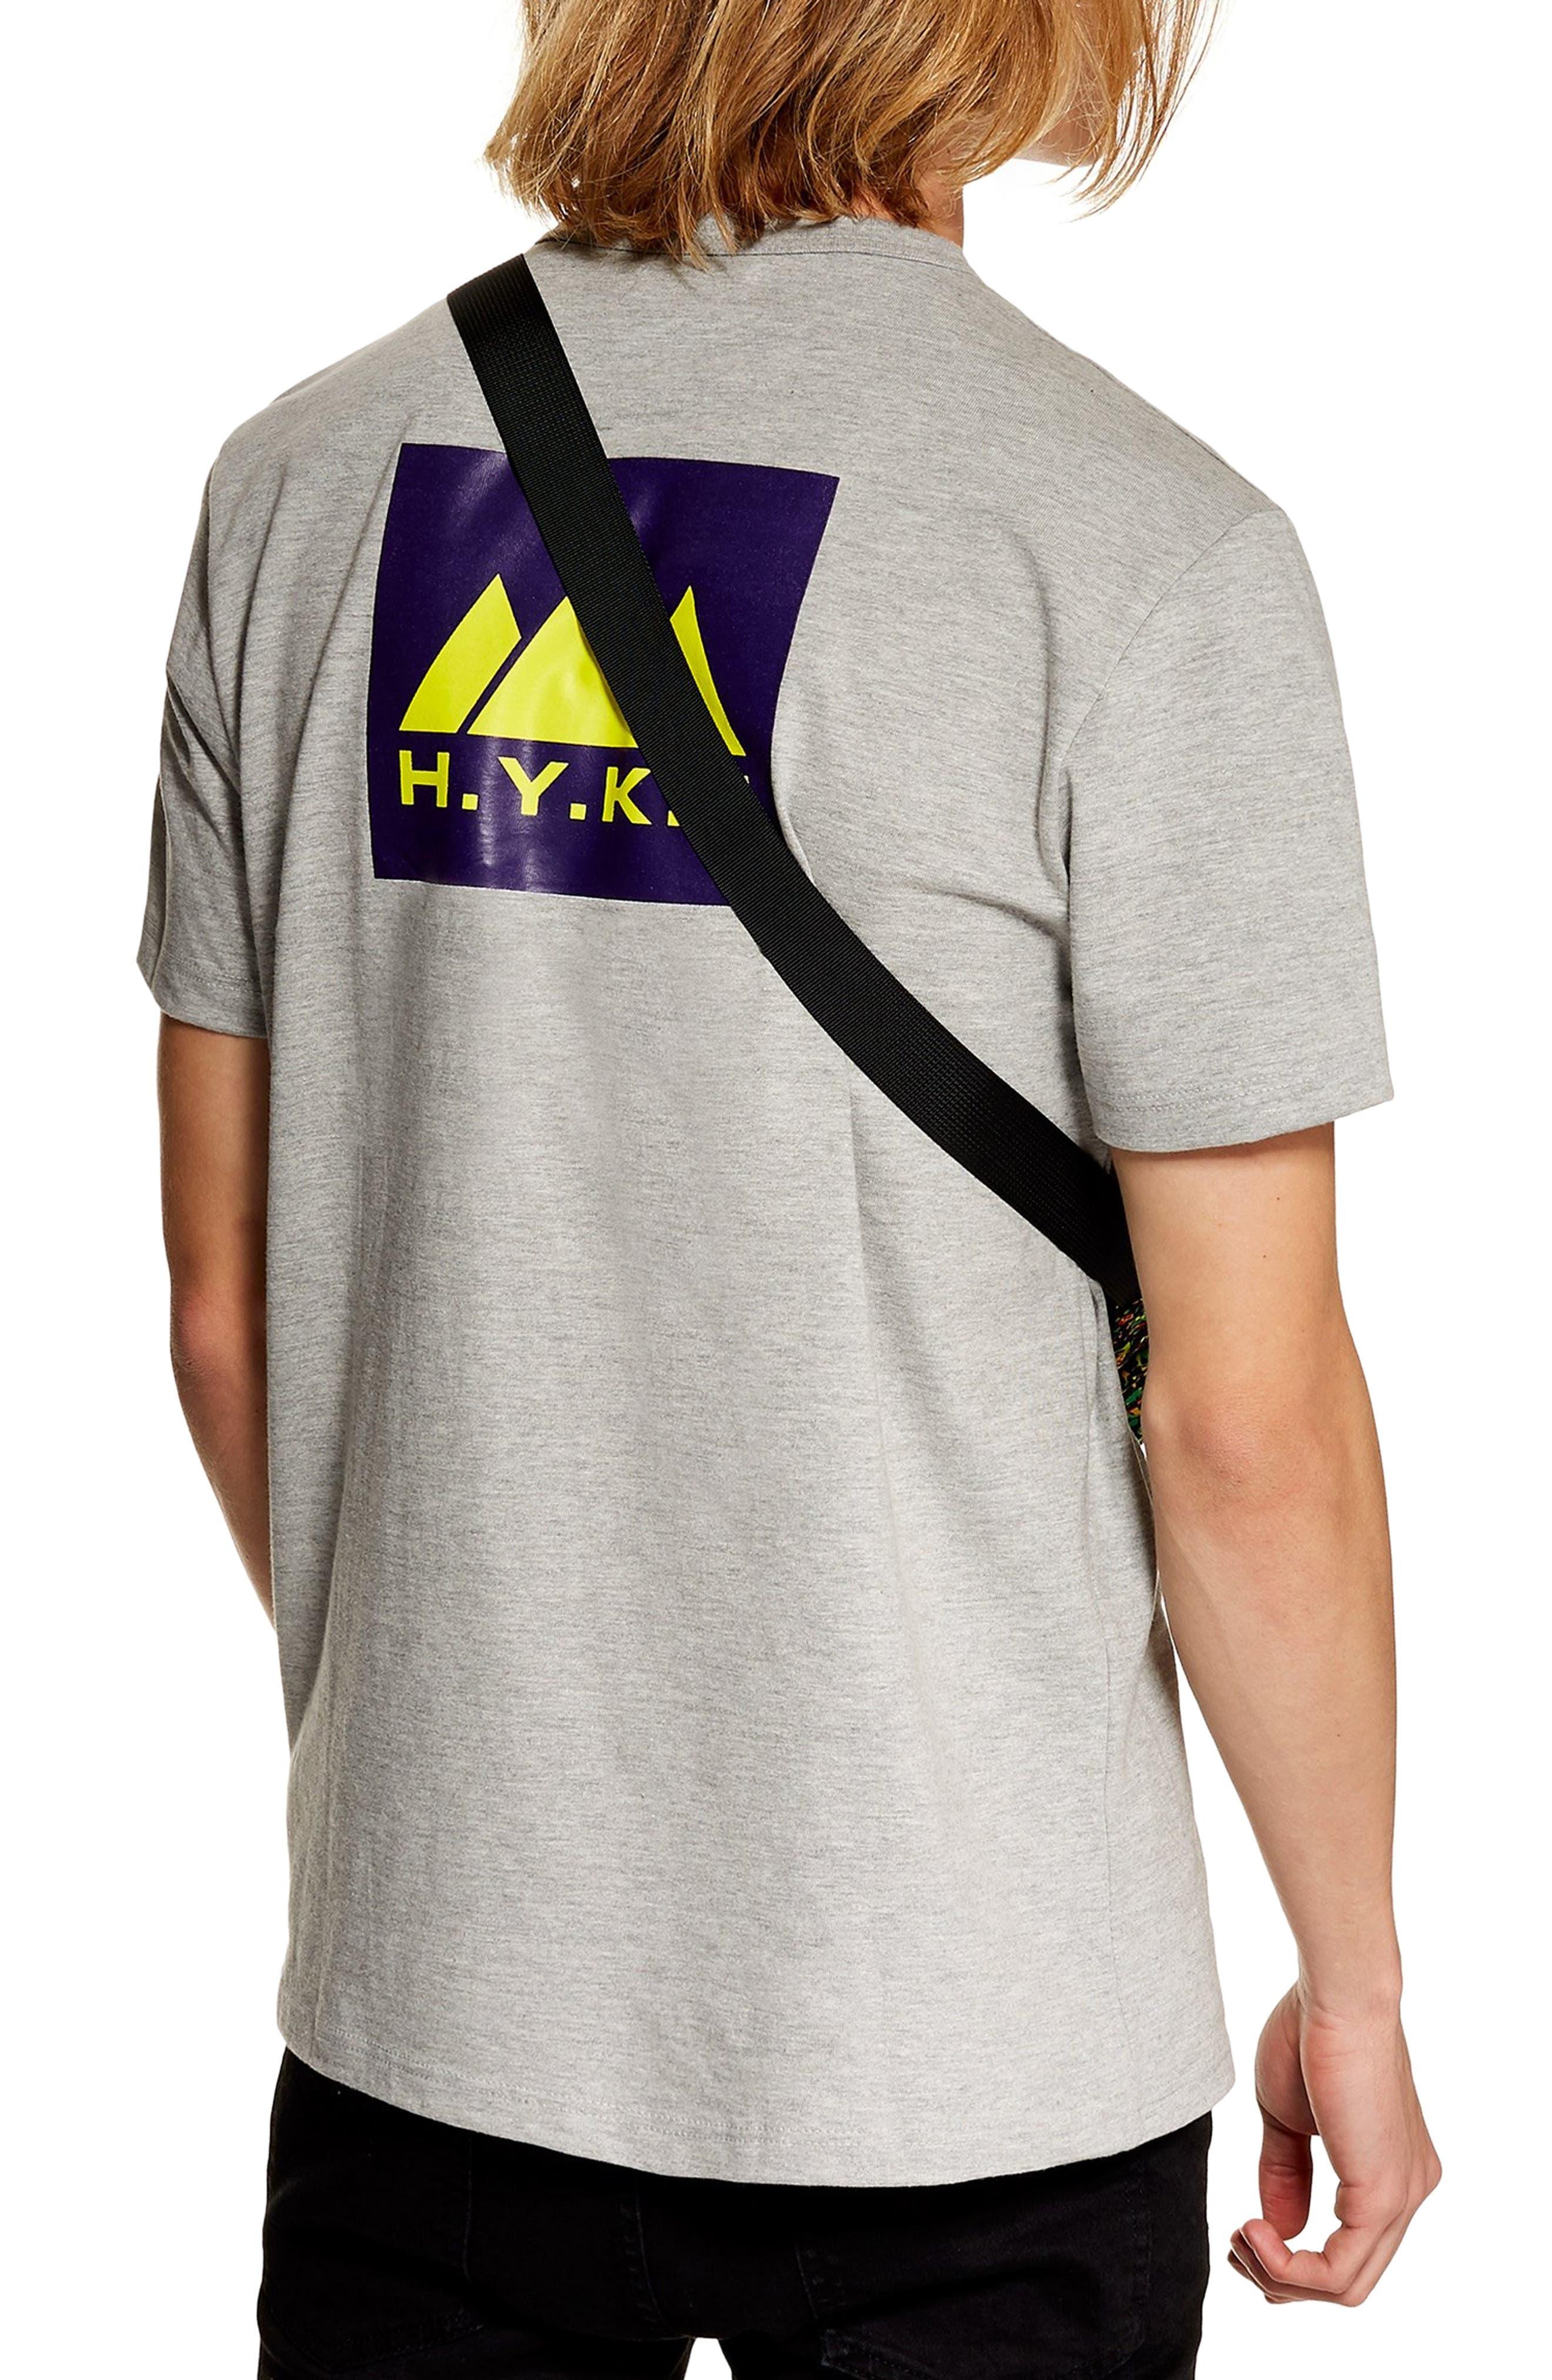 H.Y.K.E. Graphic T-Shirt,                             Alternate thumbnail 2, color,                             GREY